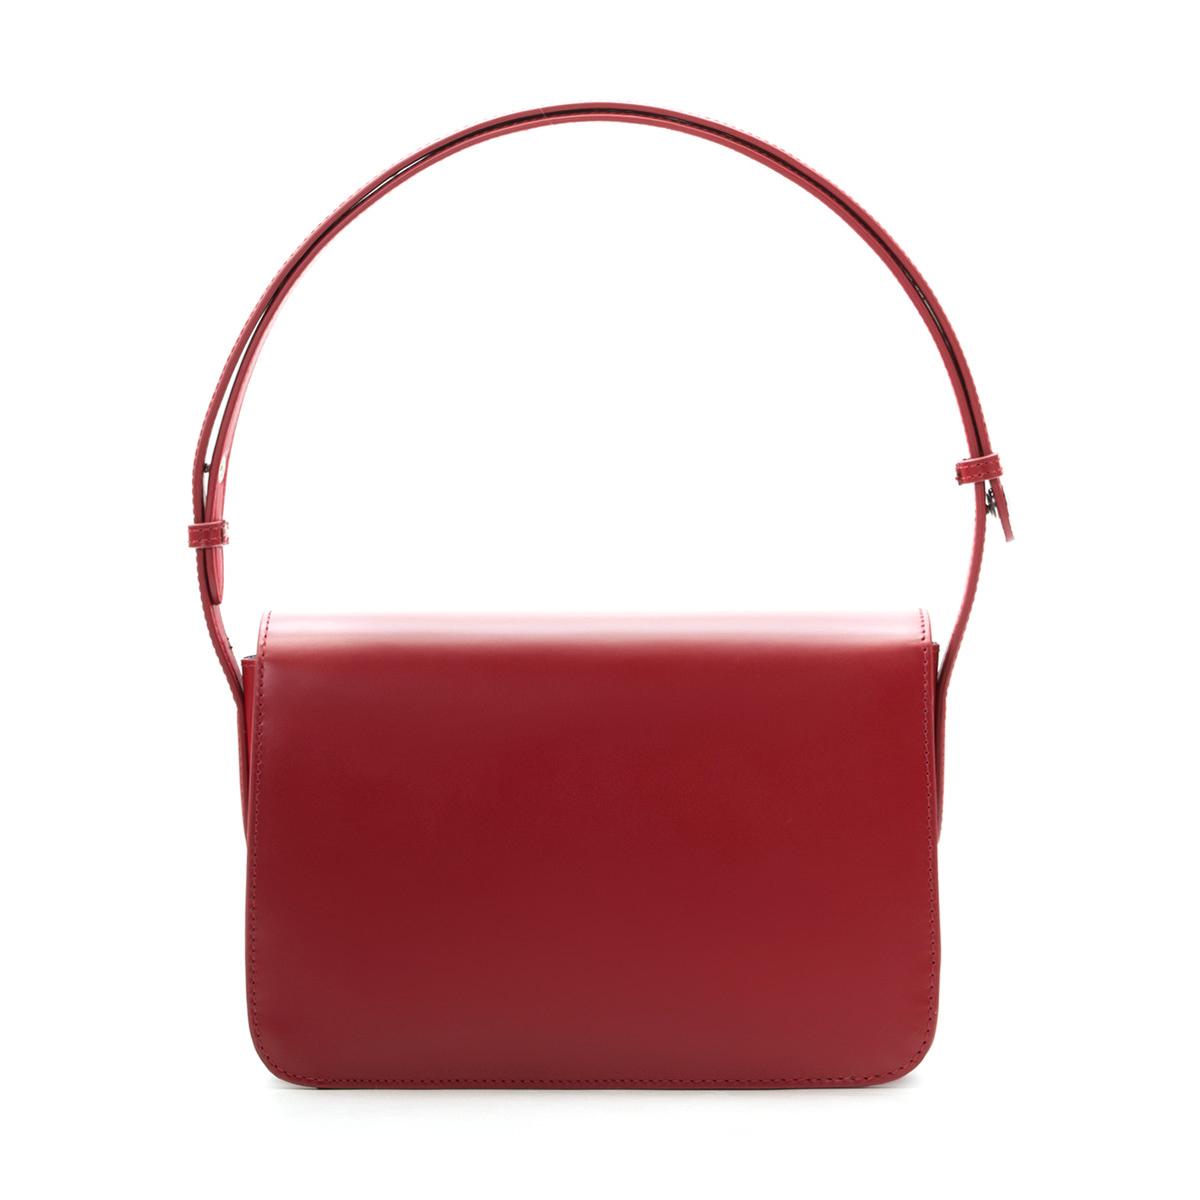 A.Cloud Balance Collection--Envelope Bag